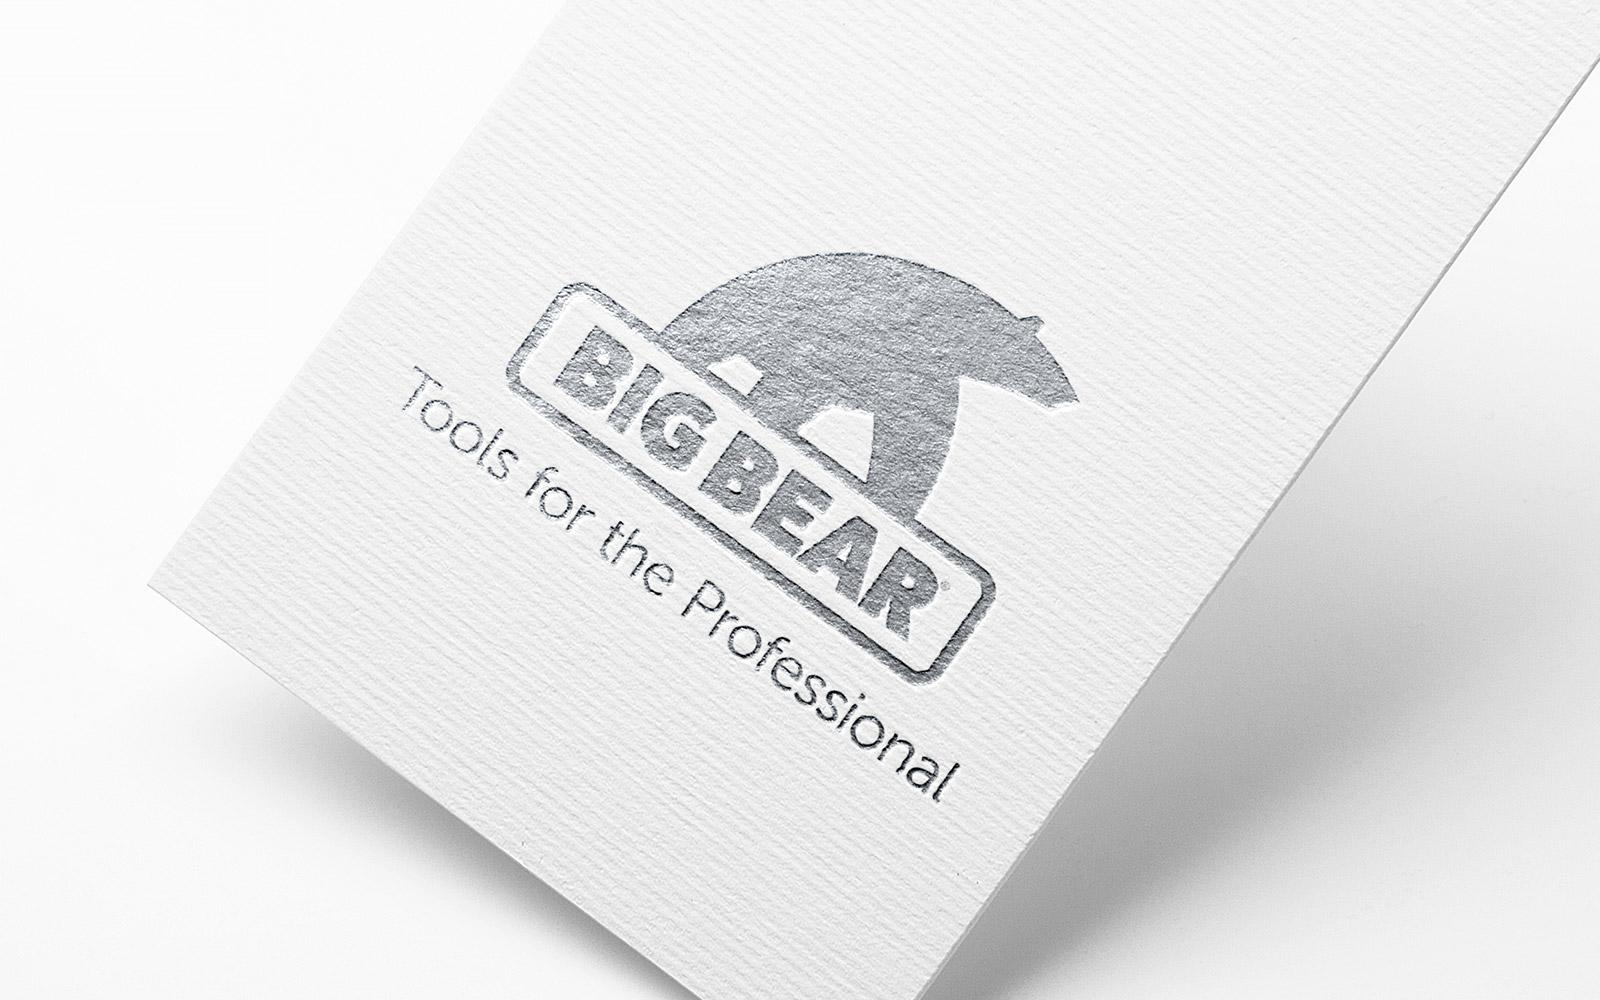 Big-Bear-Tools-Langley-Business Card.jpg